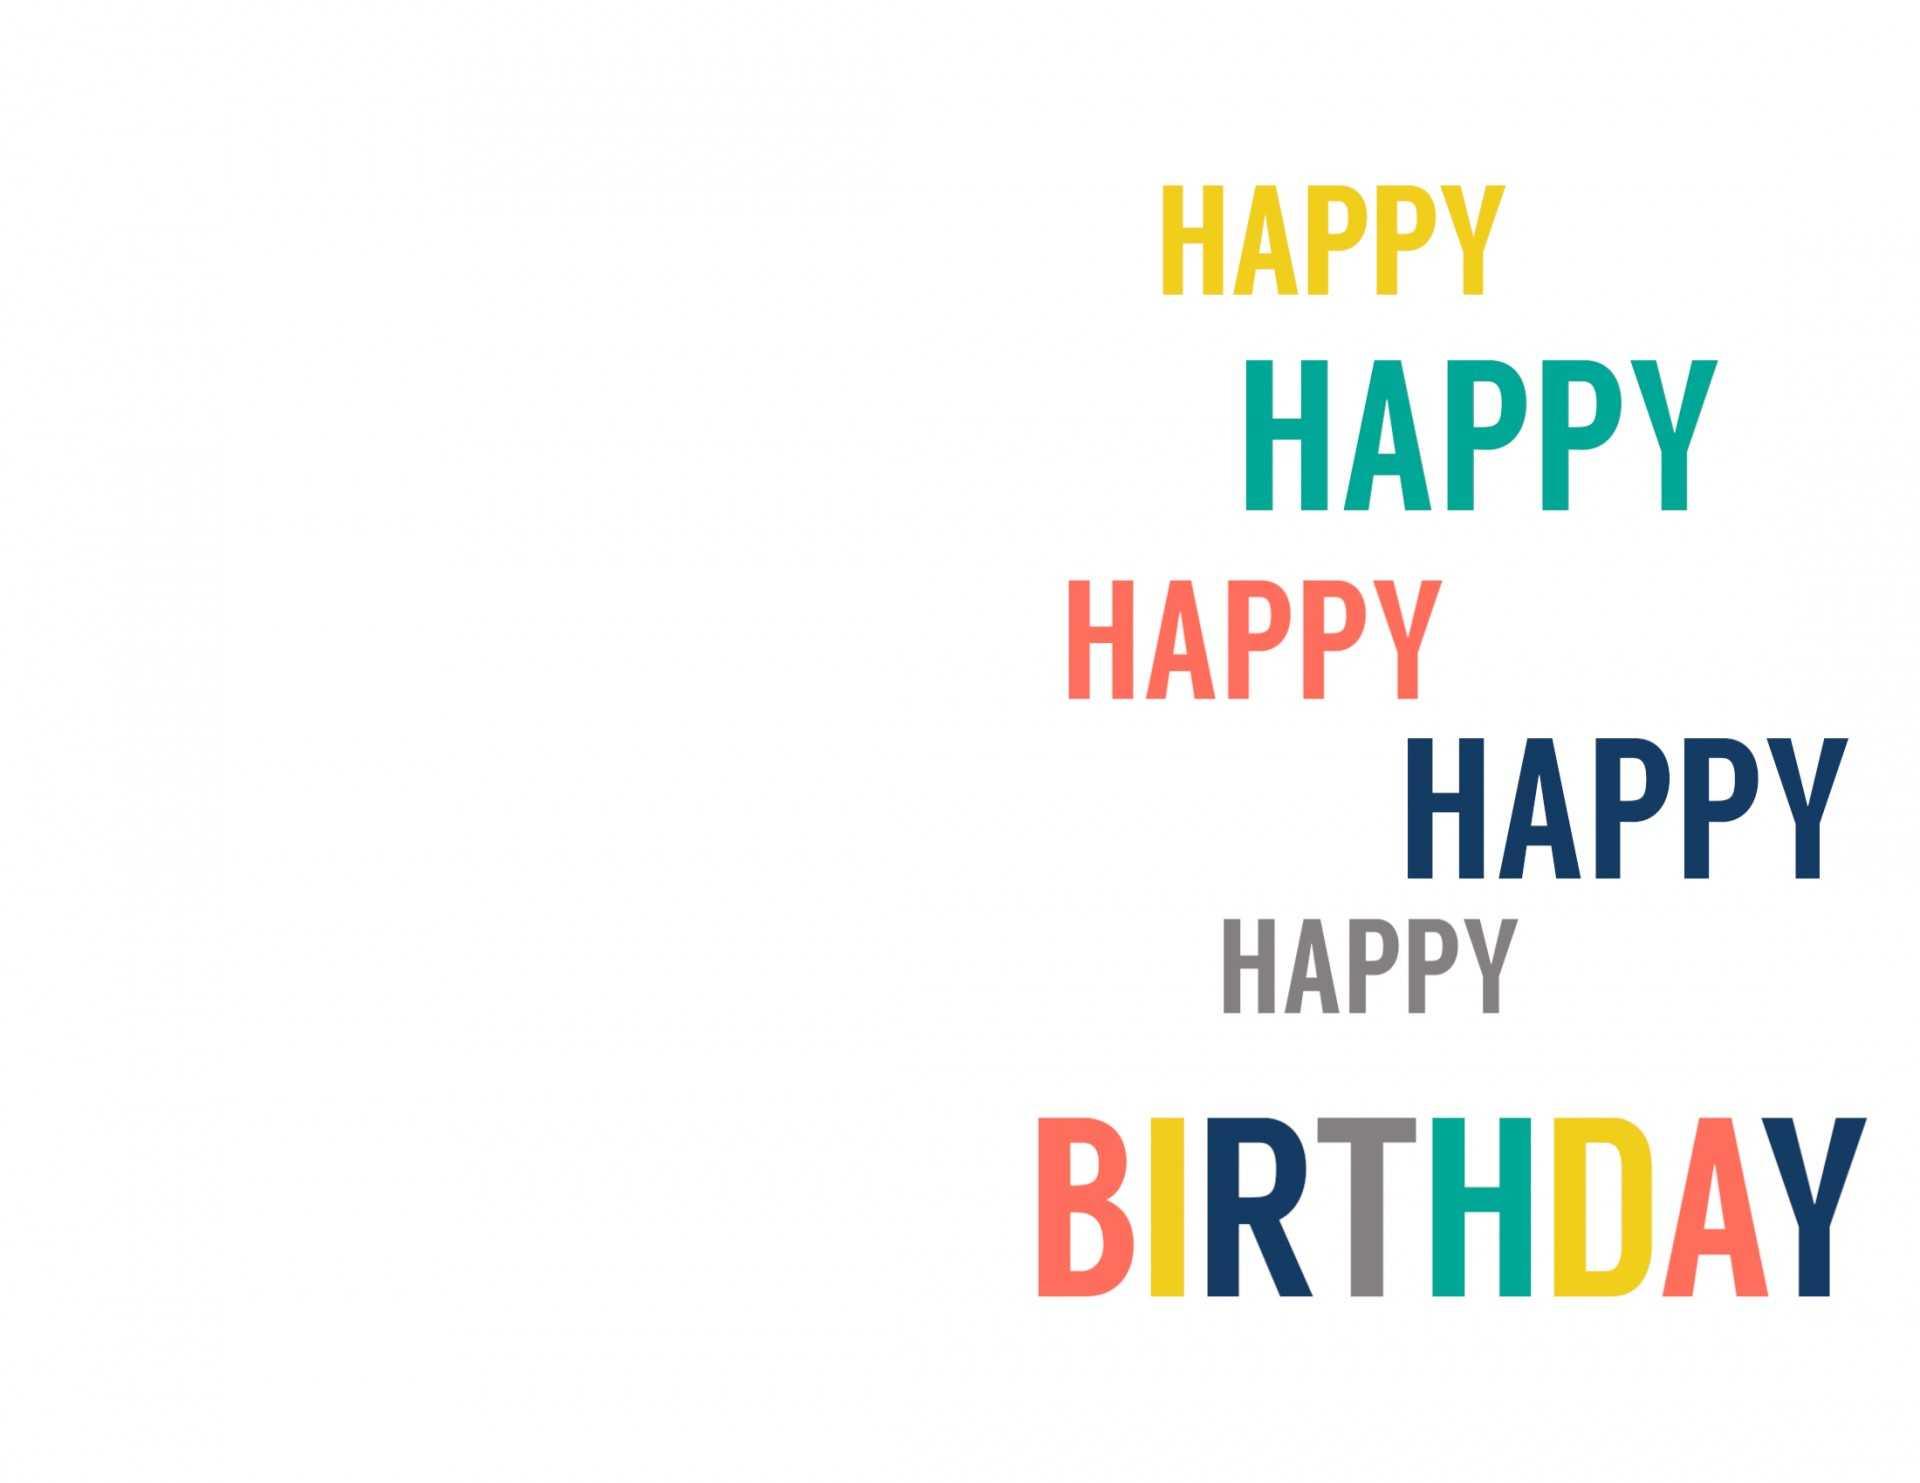 039 Printable Birthday Card Template Free Greeting Cards Pertaining To Foldable Birthday Card Template